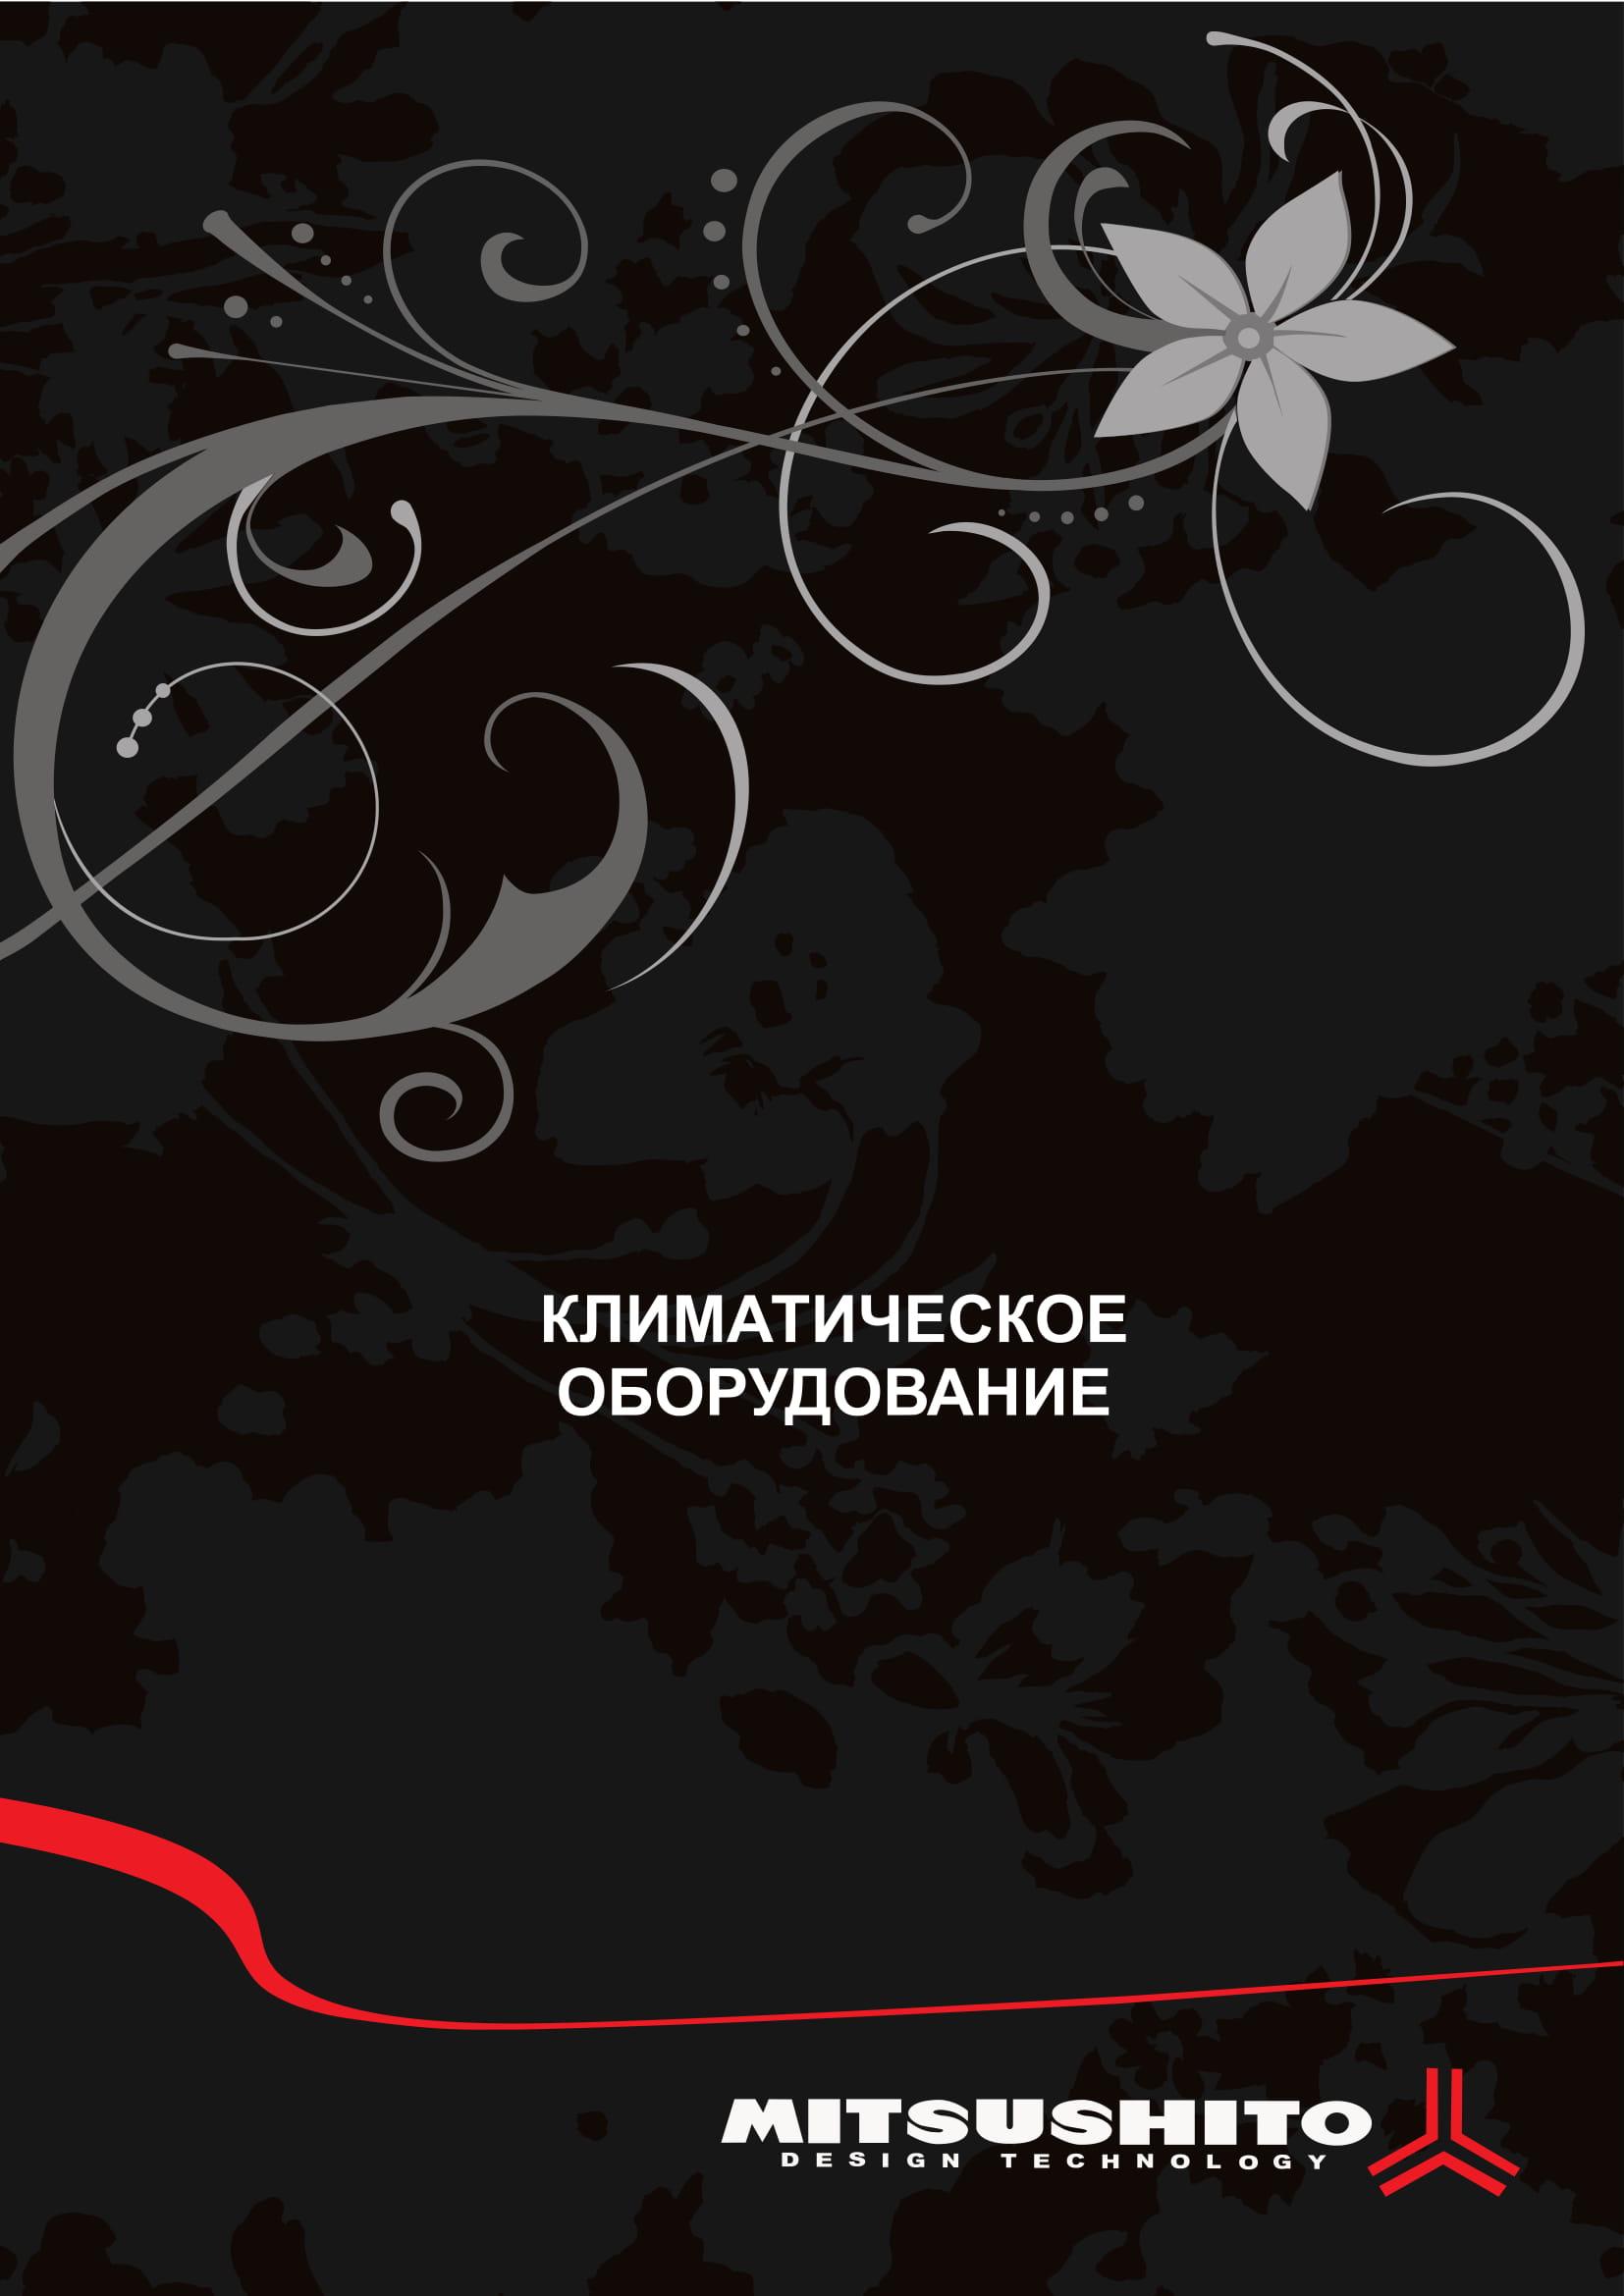 каталог Mitsushito 2011